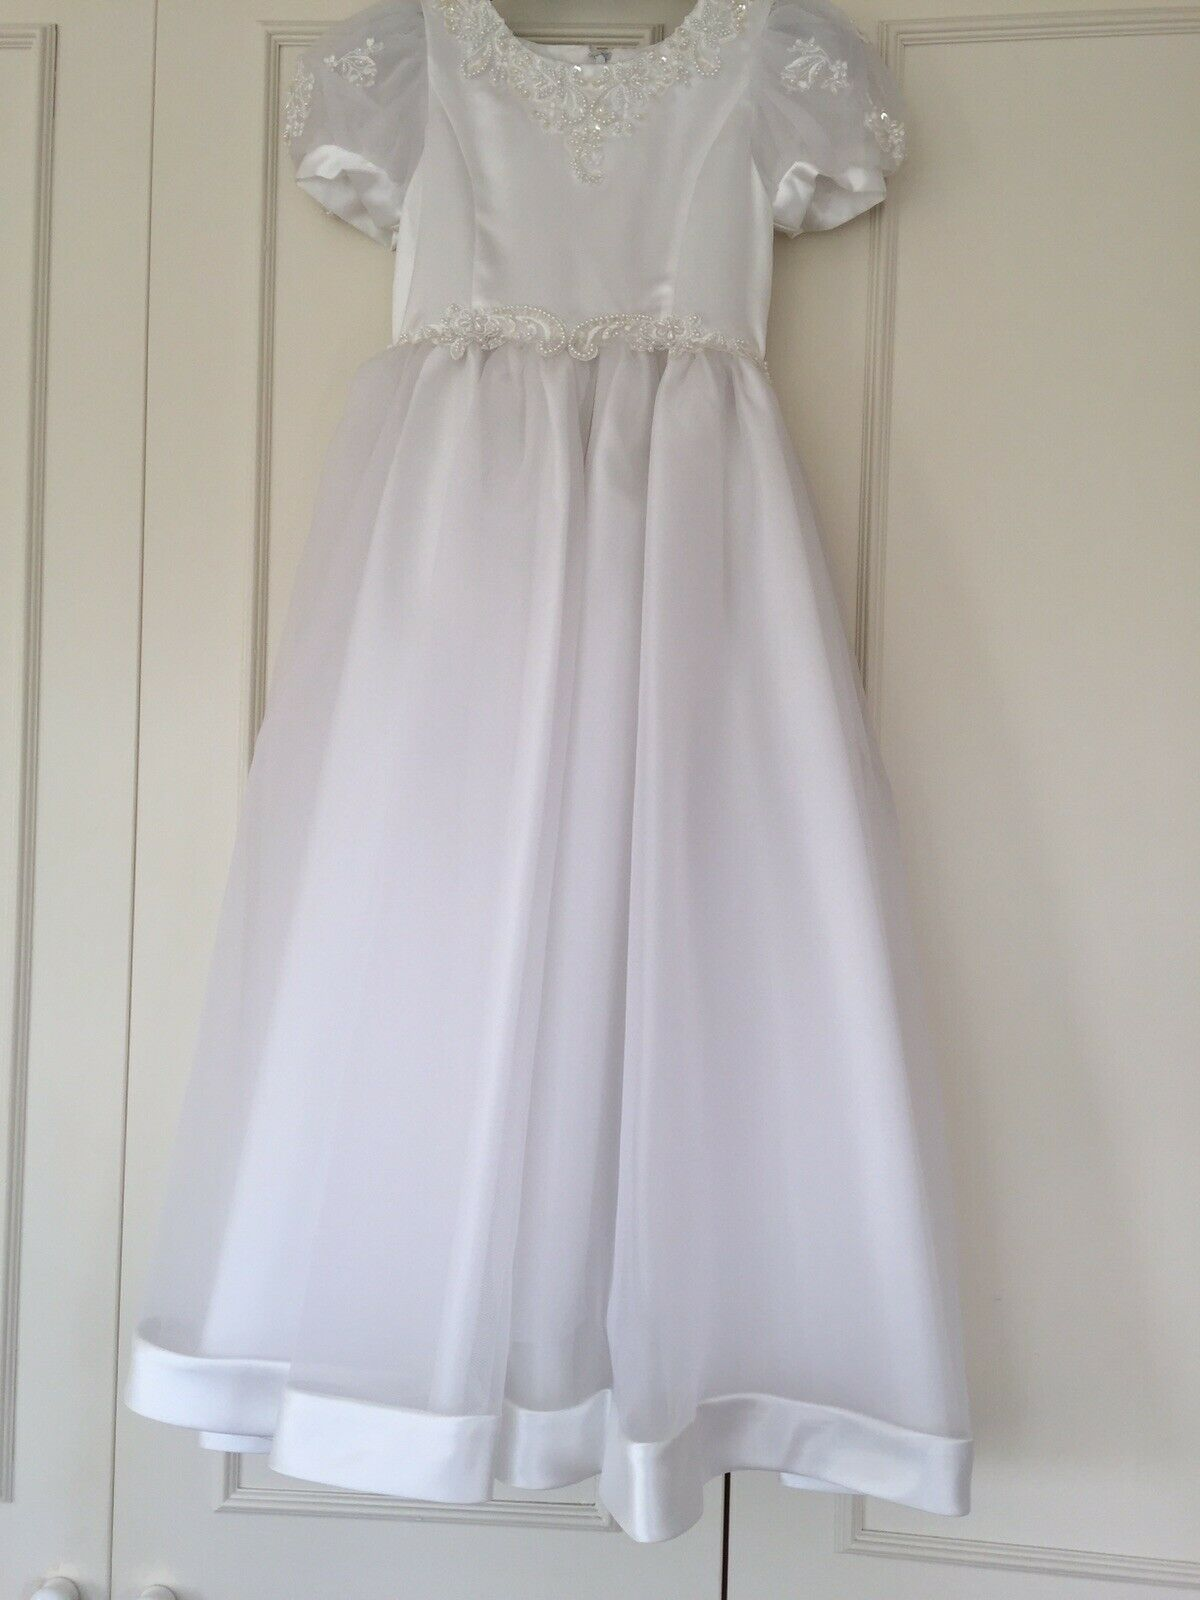 "Flower Girl Dress In Silver Grey Tulle & White Satin Age 8 Length 43"""